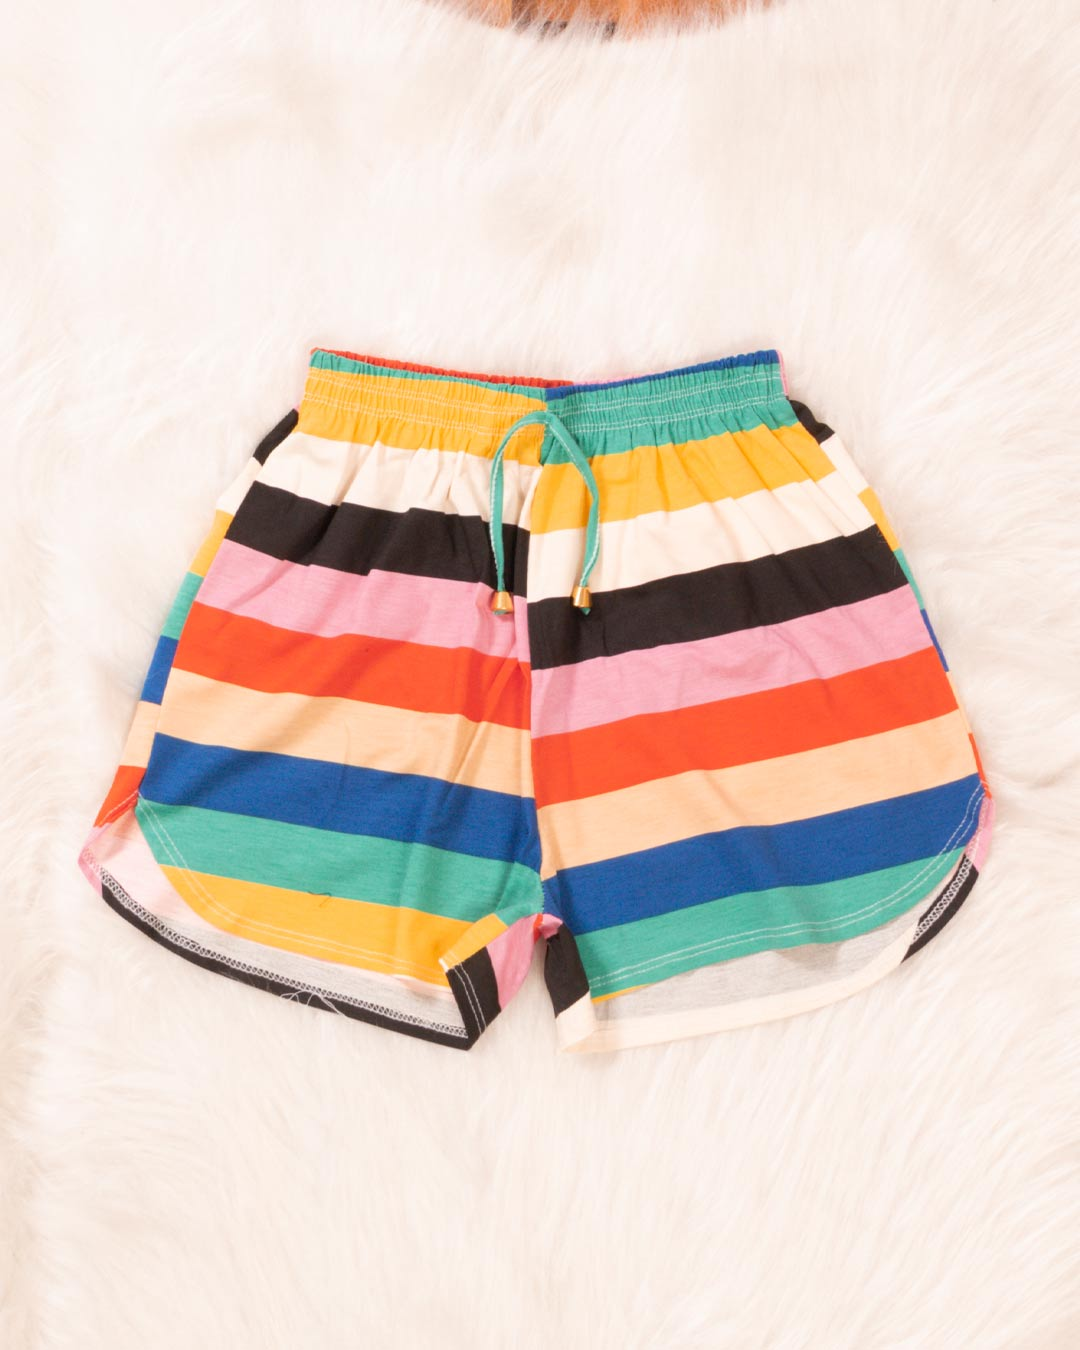 Shorts Adulto Estampa Colorida - Moça Bonita